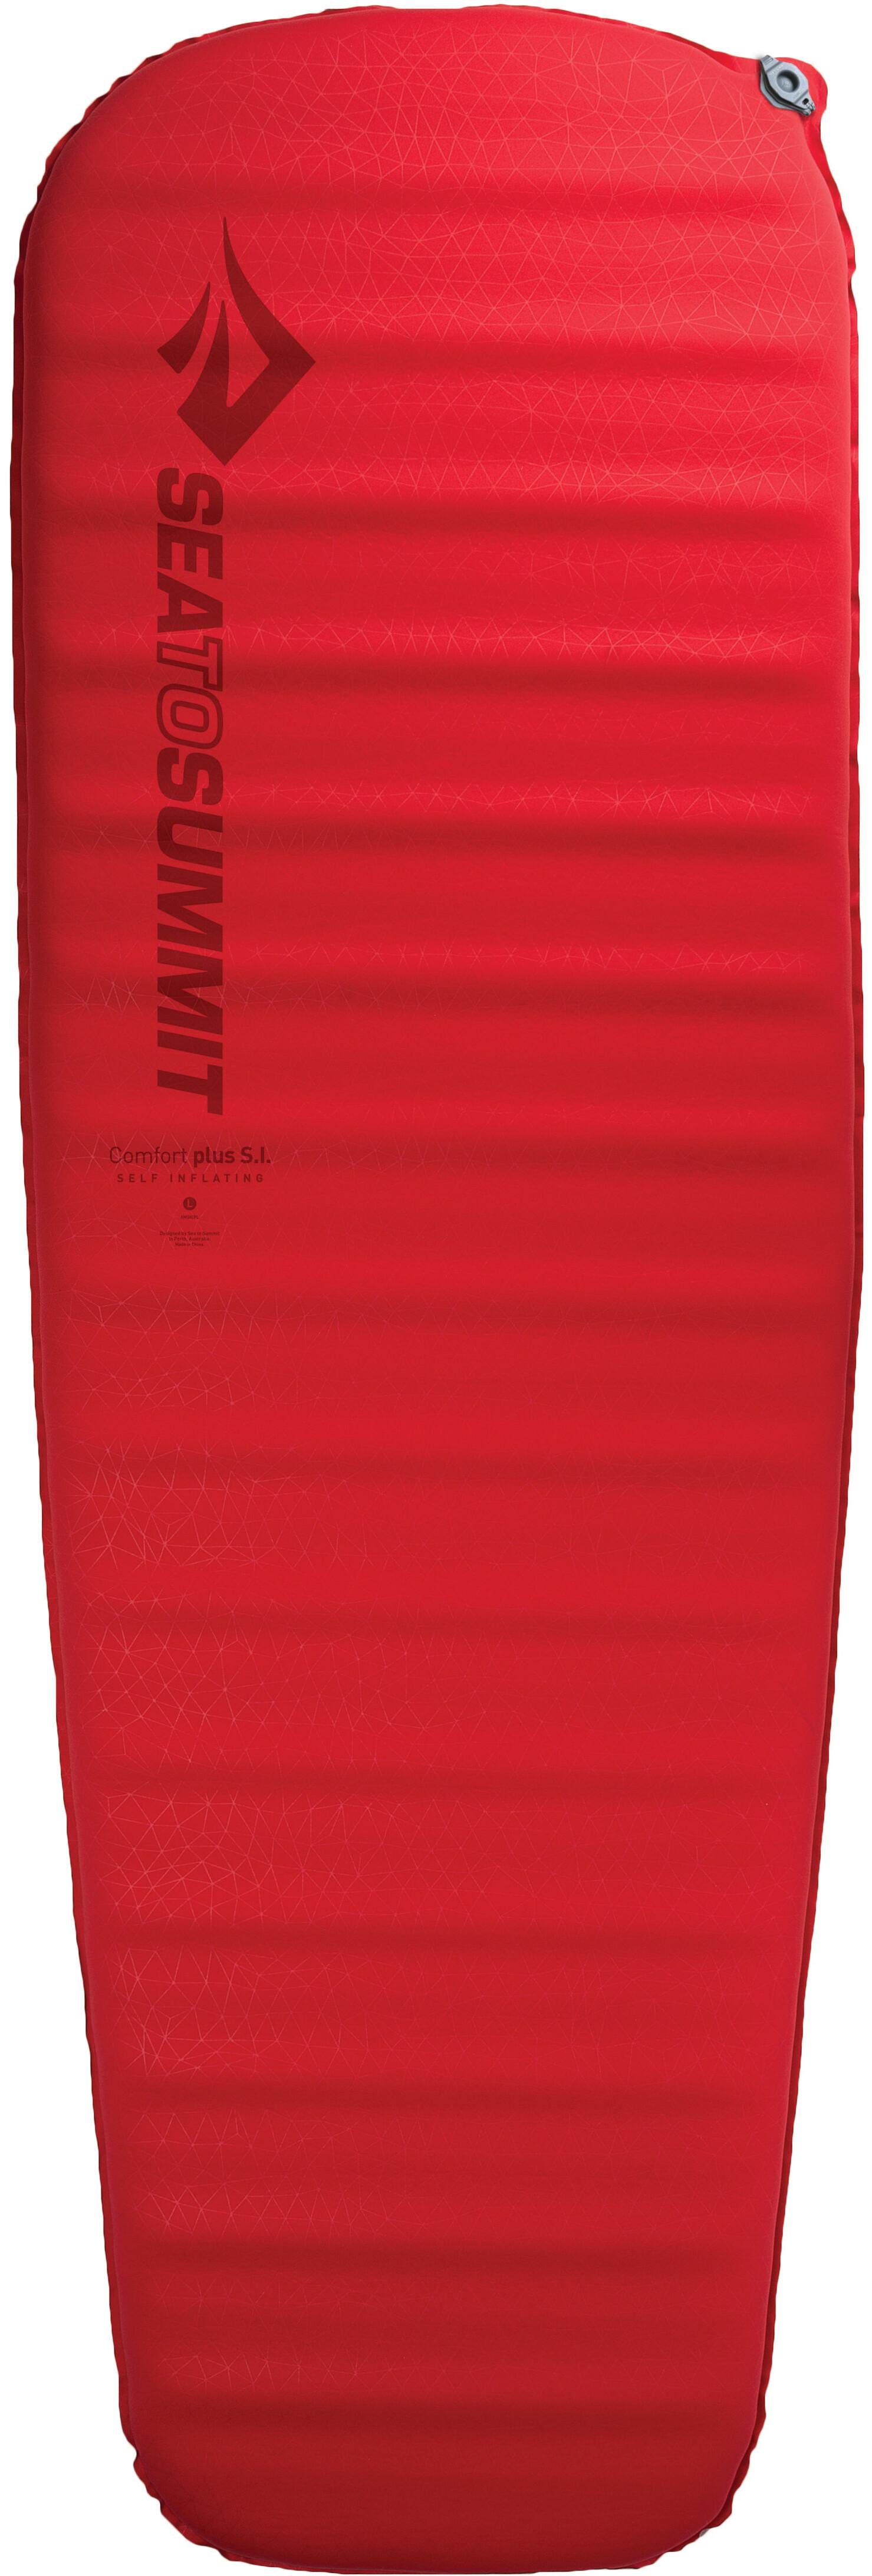 Sea To Summit Comfort Plus Si Slaapmat Large Rood L Outdoor Winkel Matras Sleeping Mat Regular